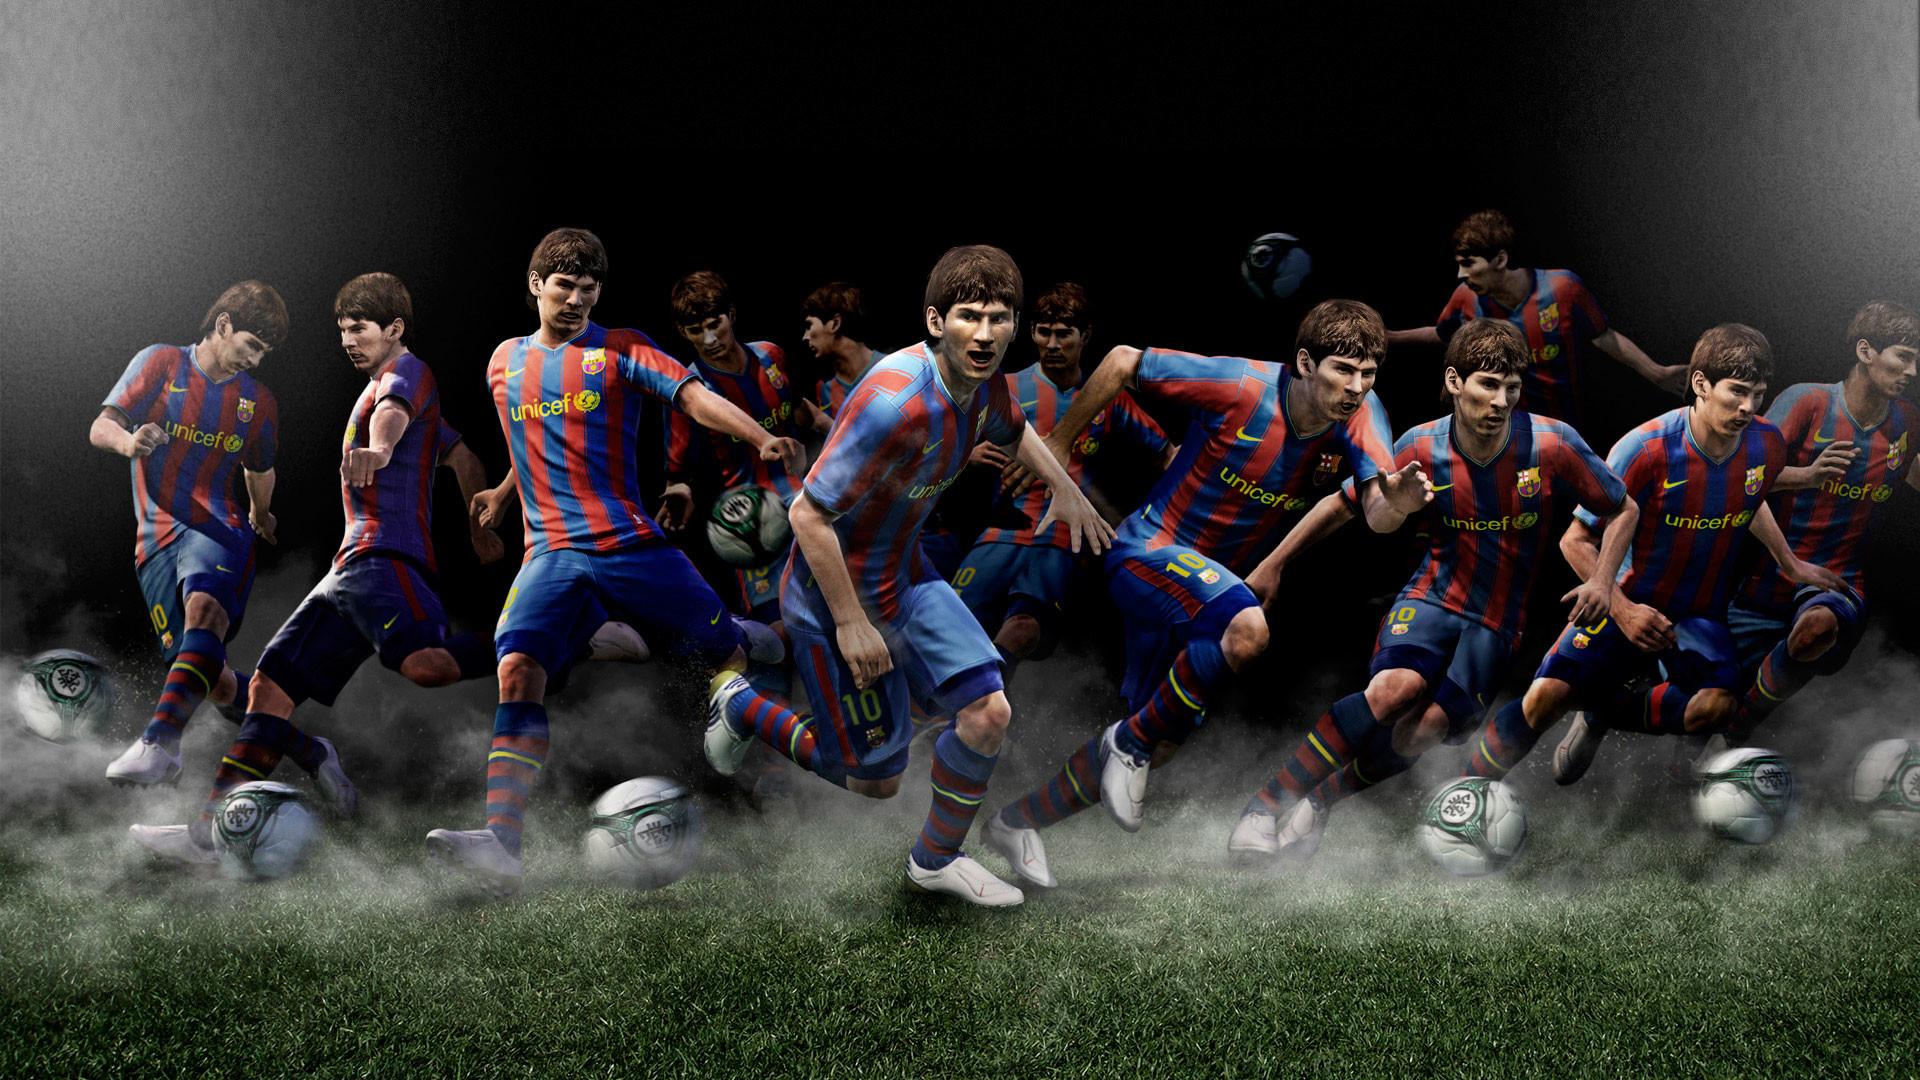 Top wallpapers blog: Street football wallpapers 2560×1440 HD Football  Wallpapers 1080p (51